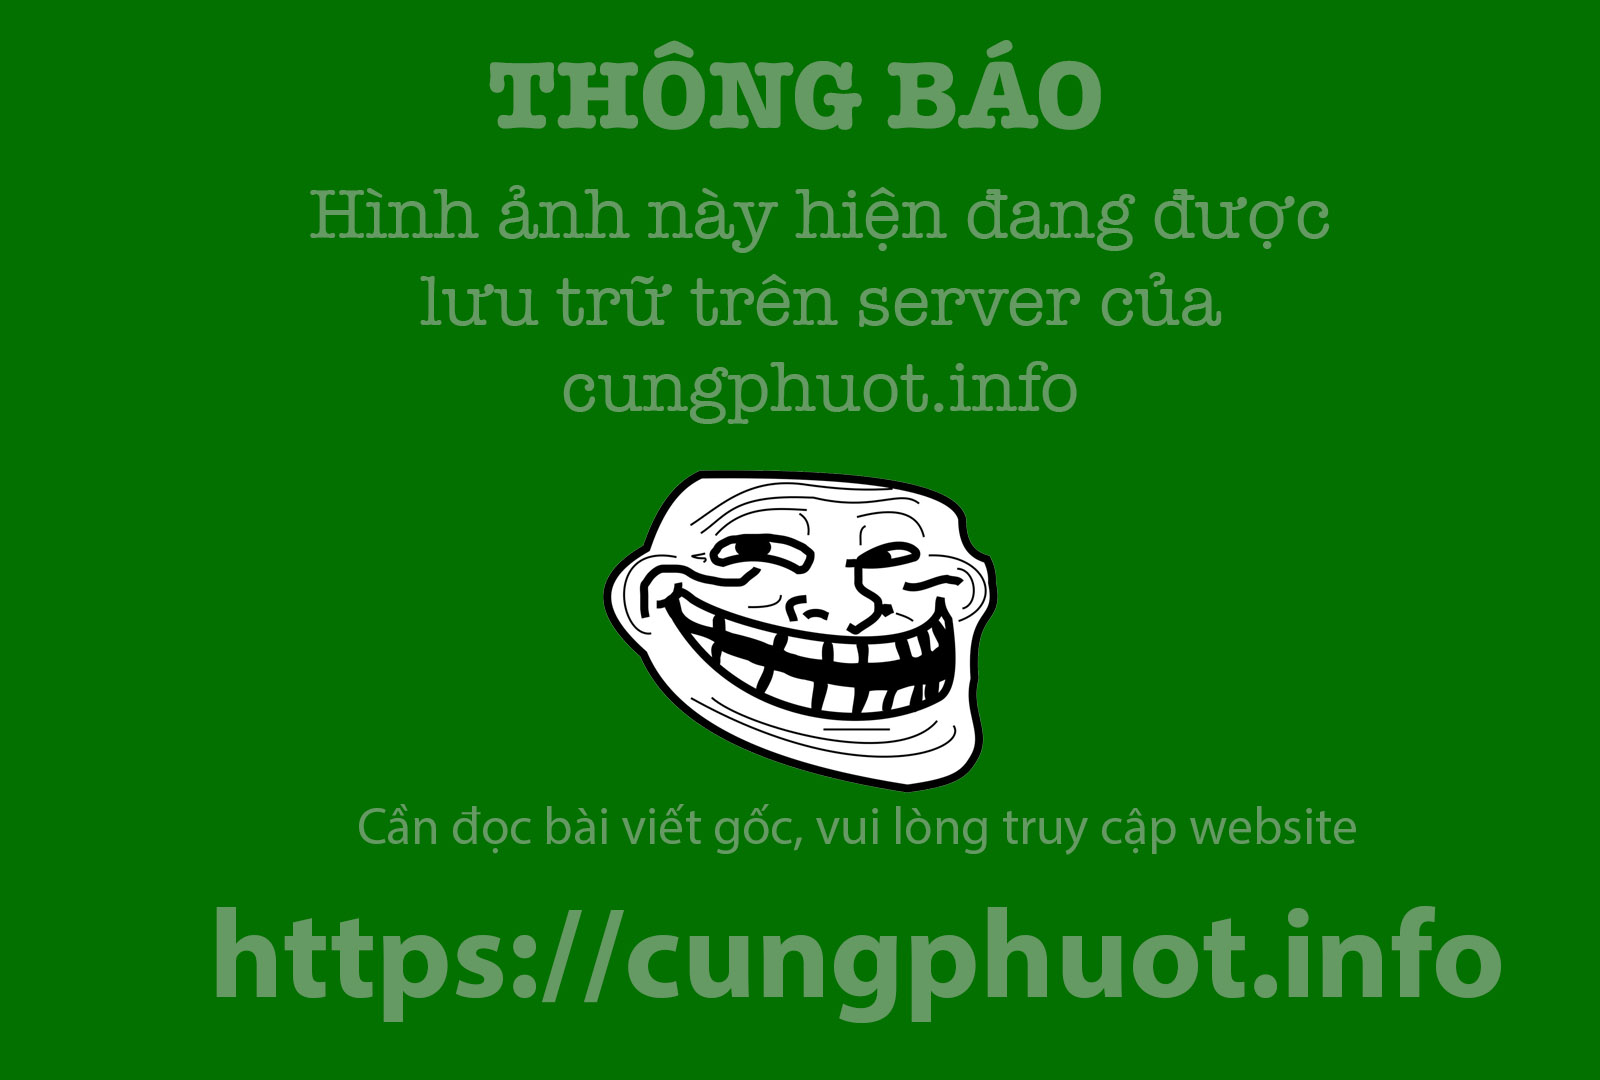 Co do Hue dep la trong suong mu hinh anh 1